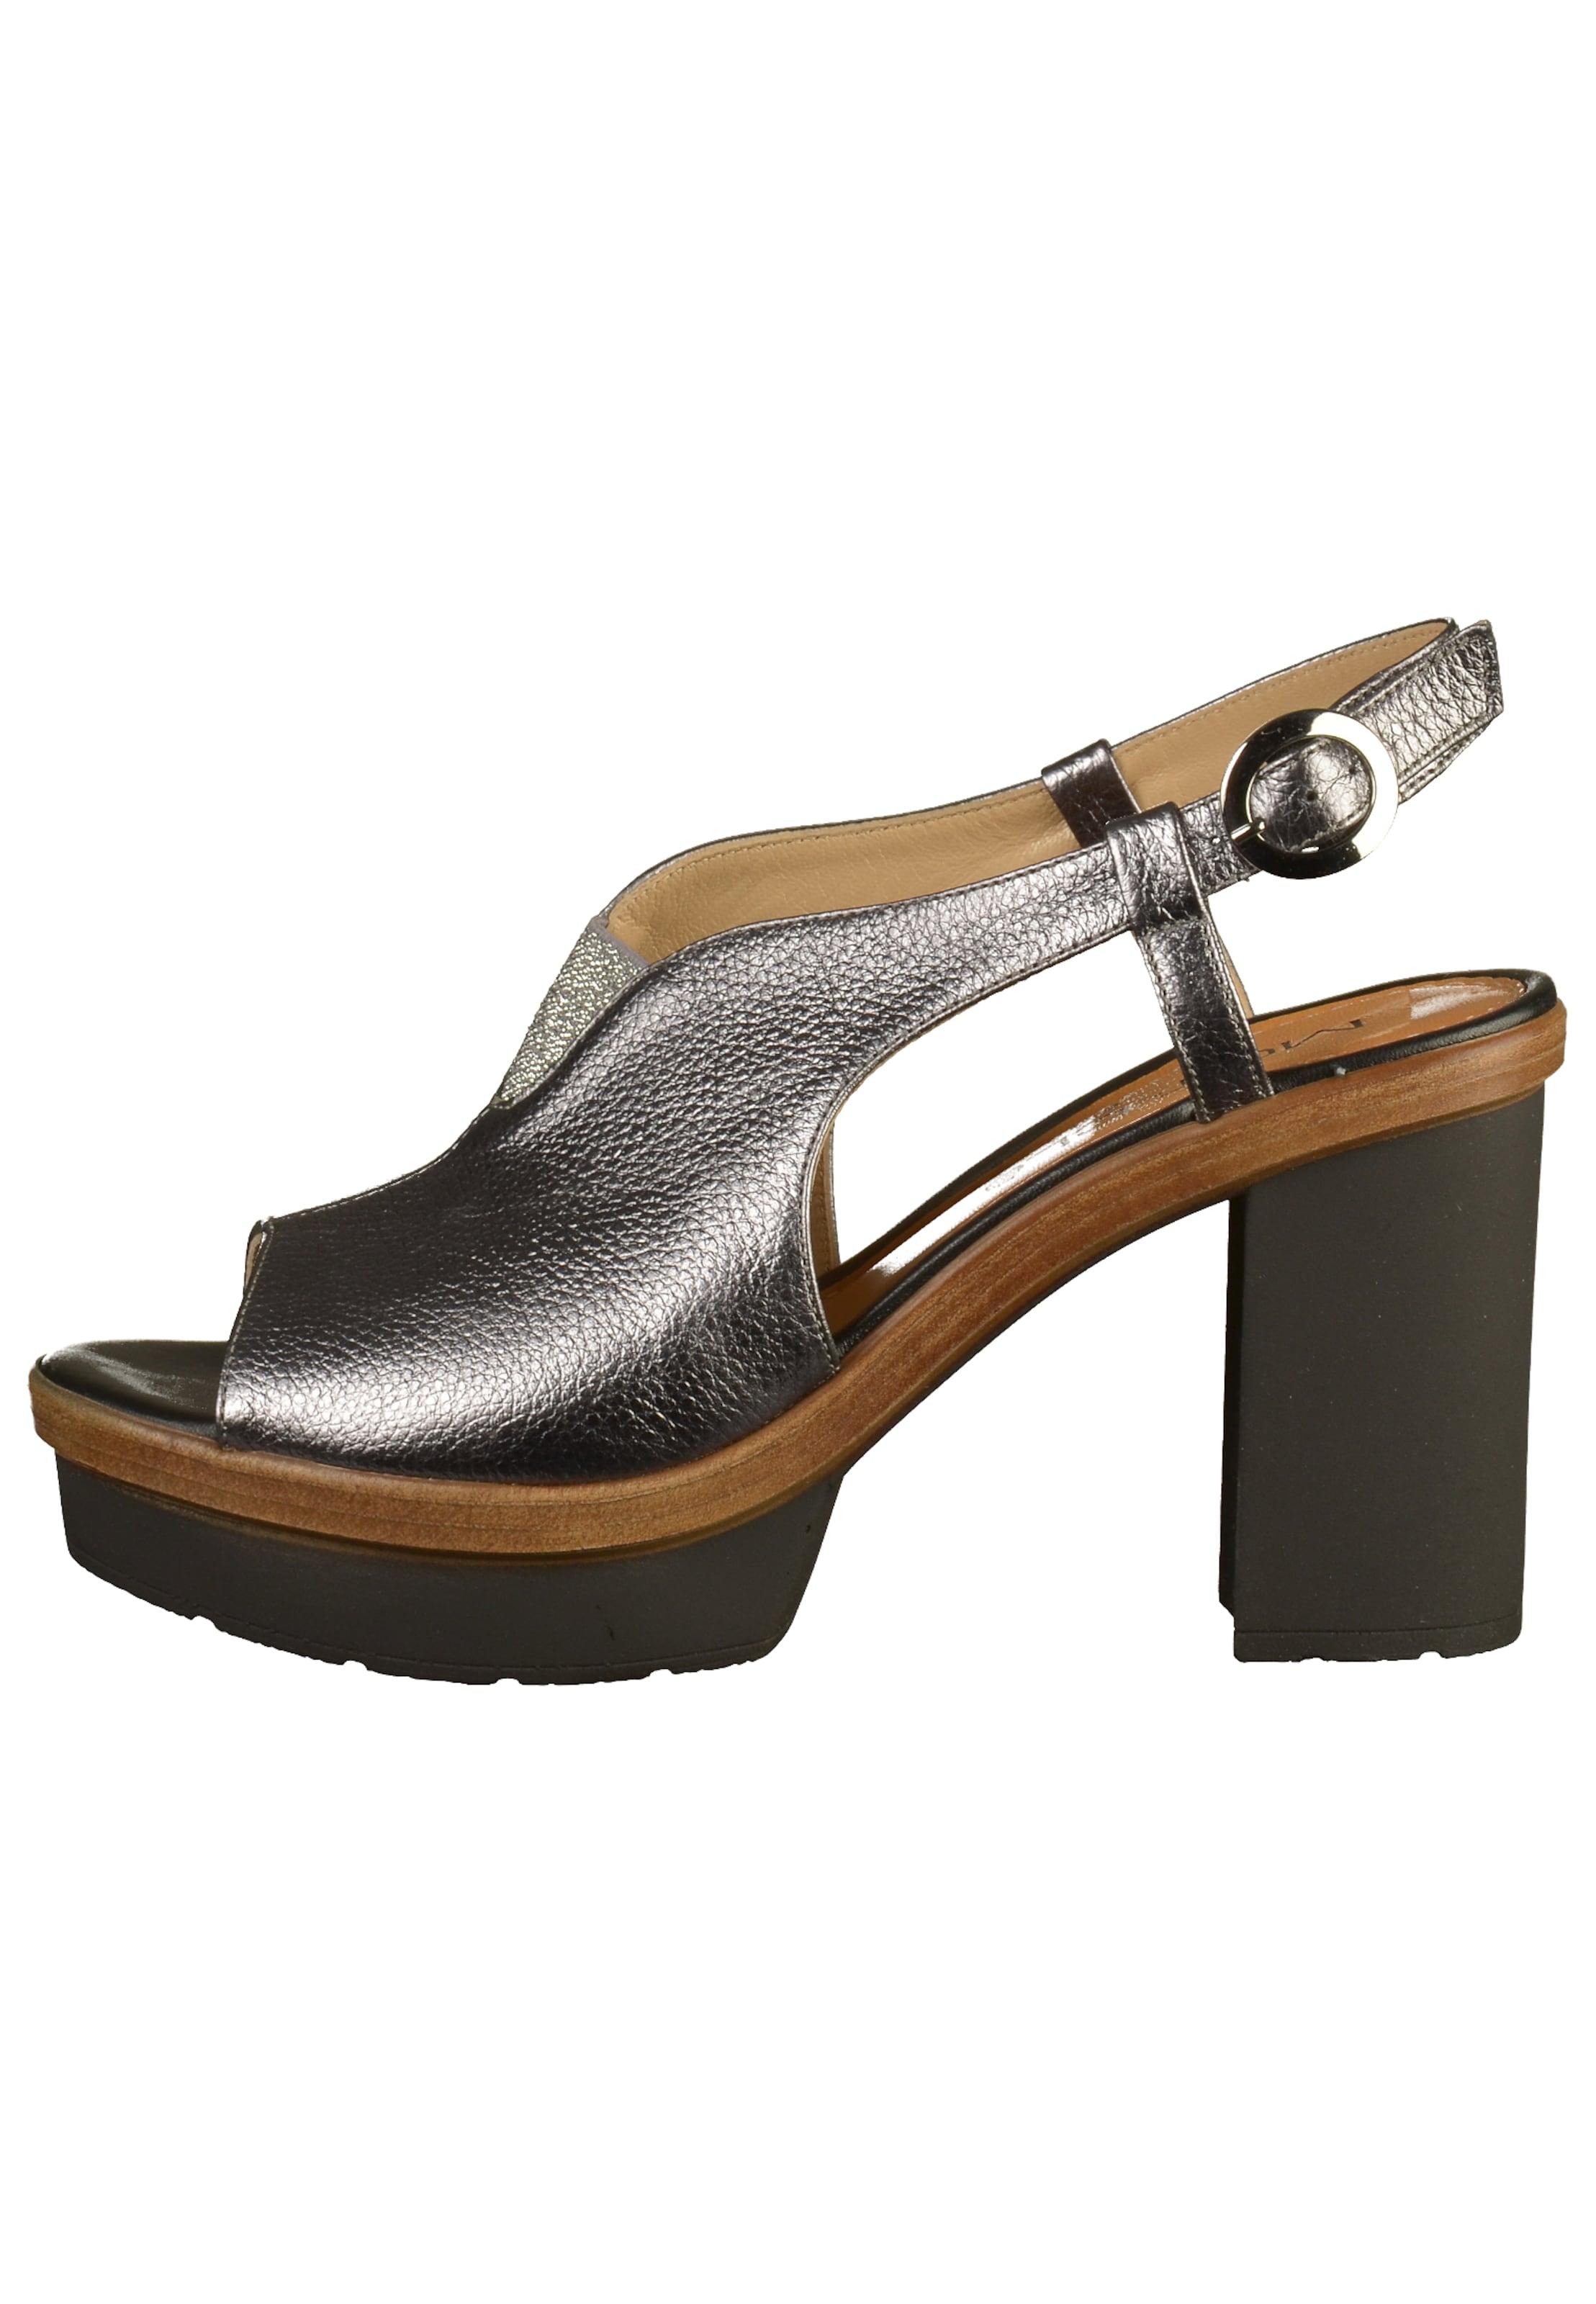 BraunSchwarz Sandalette Mot clè In Silber 5jRc3LqS4A